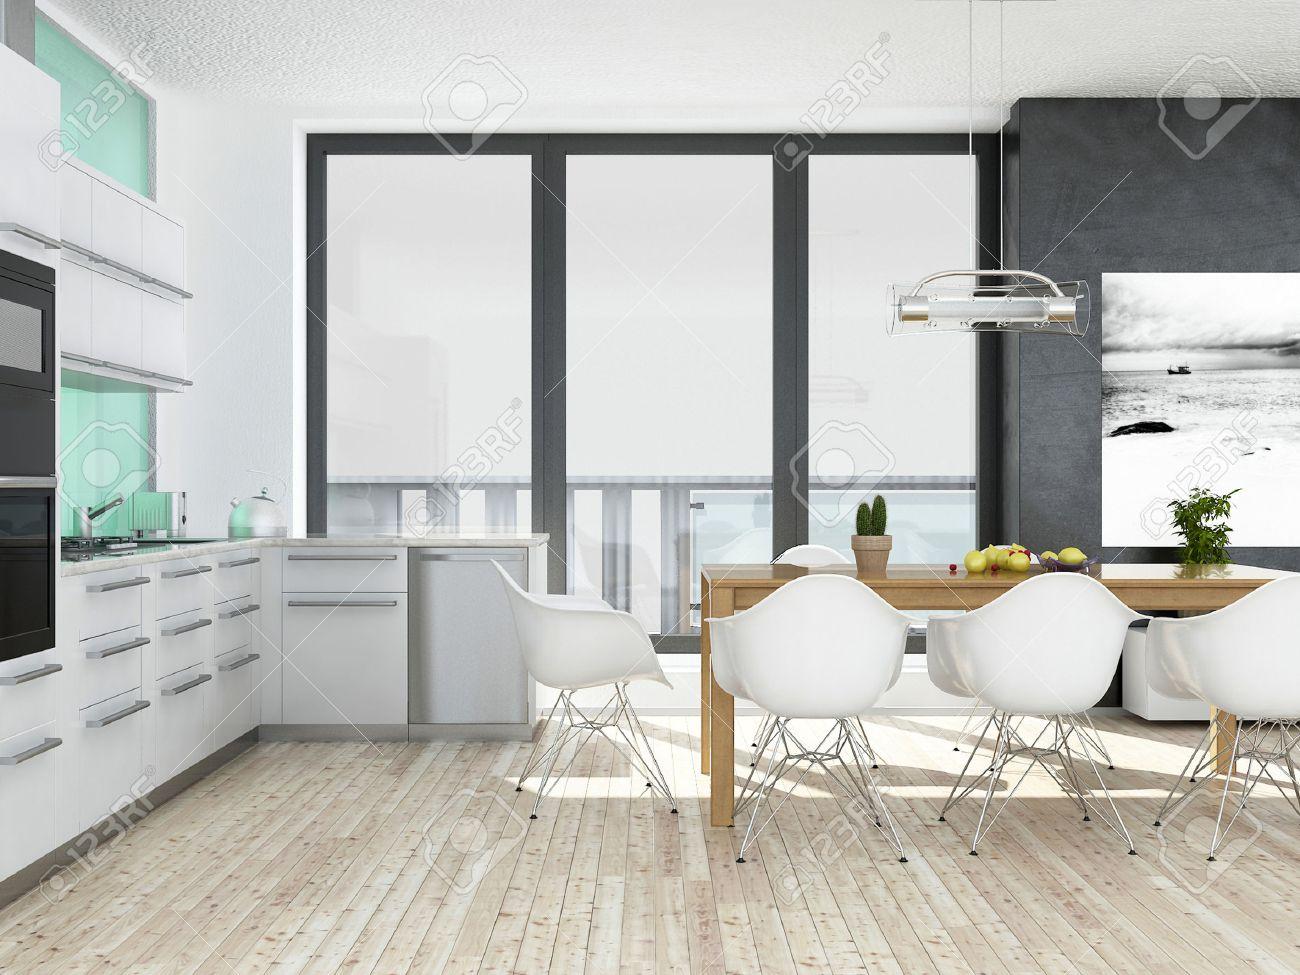 Moderne Witte En Groene Keuken Interieur Met Houten Vloer Royalty ...